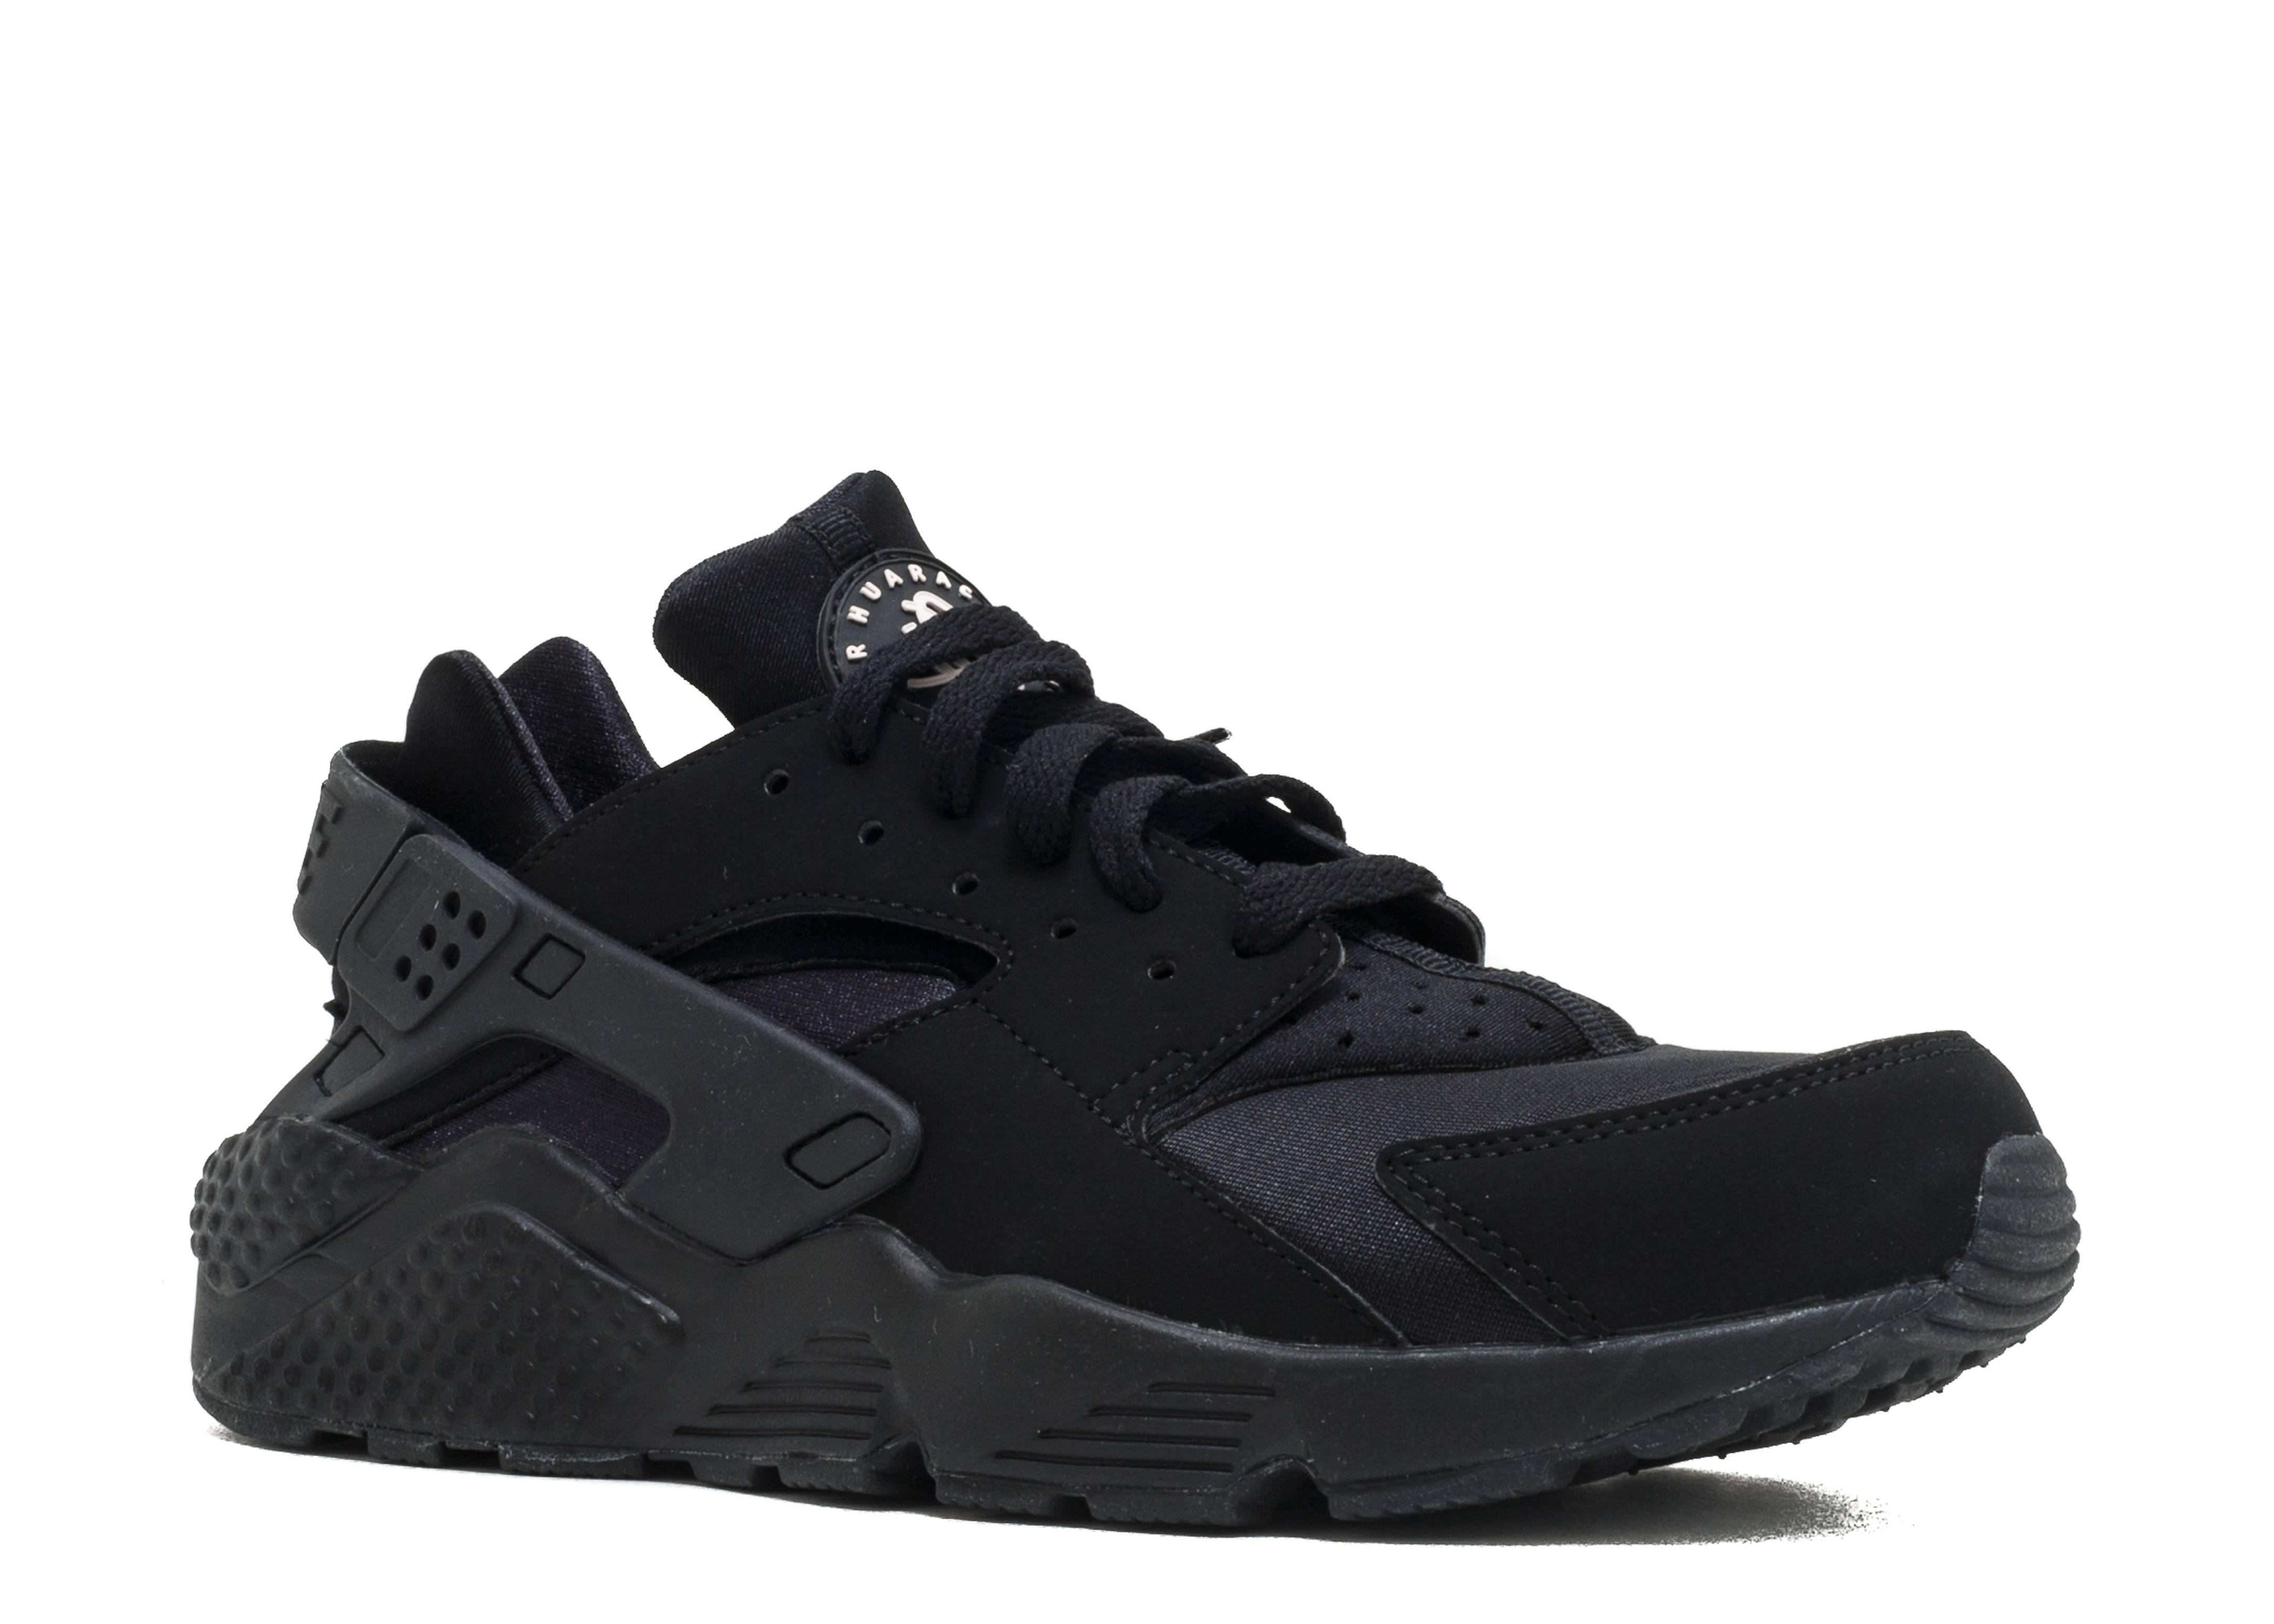 air huarache - black/black-white - Nike Running - Nike | Flight Club